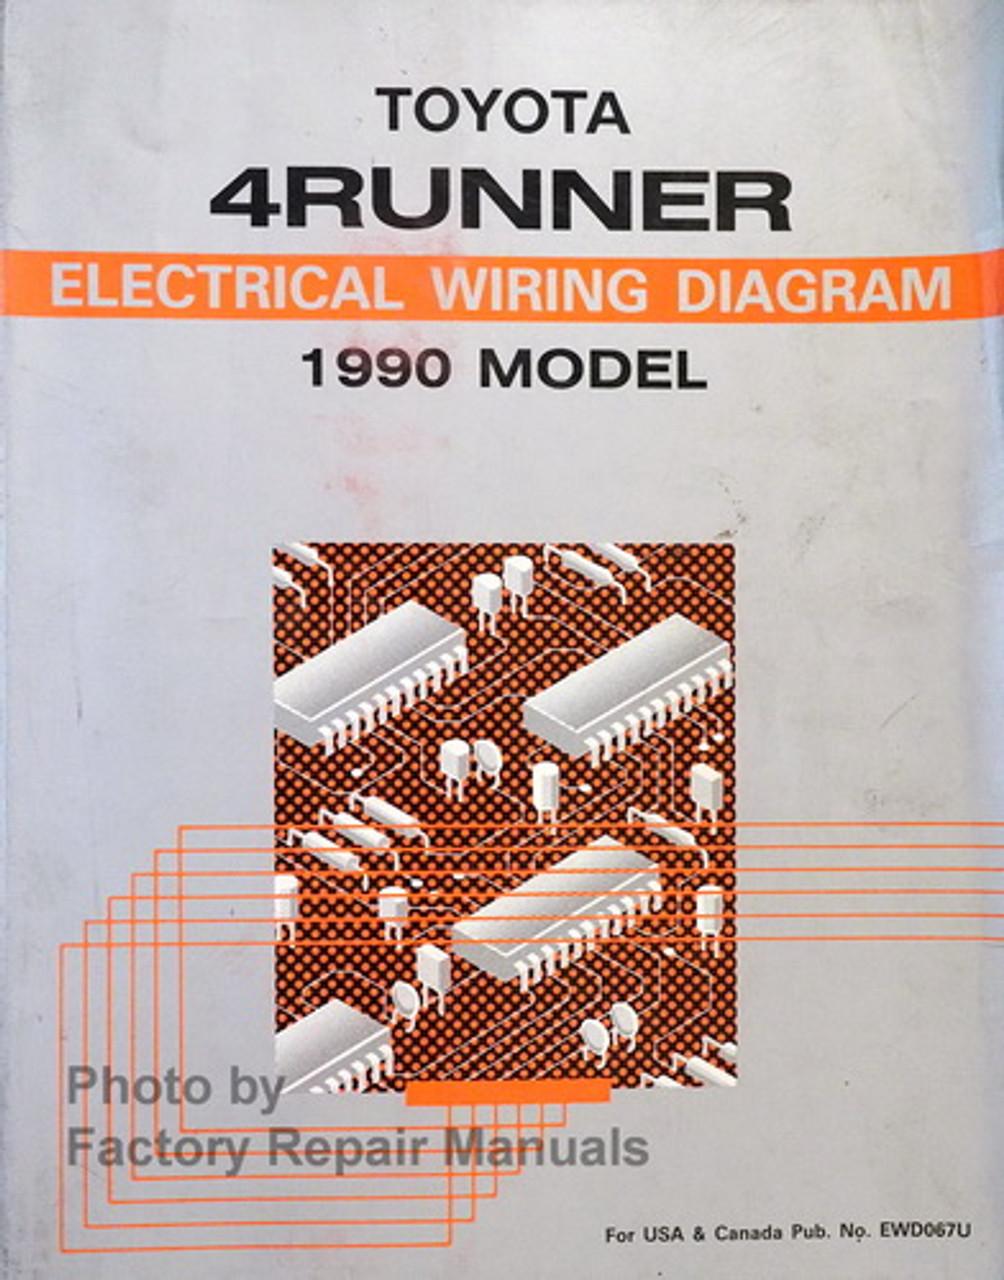 1990 Toyota 4runner Electrical Wiring Diagrams Manual